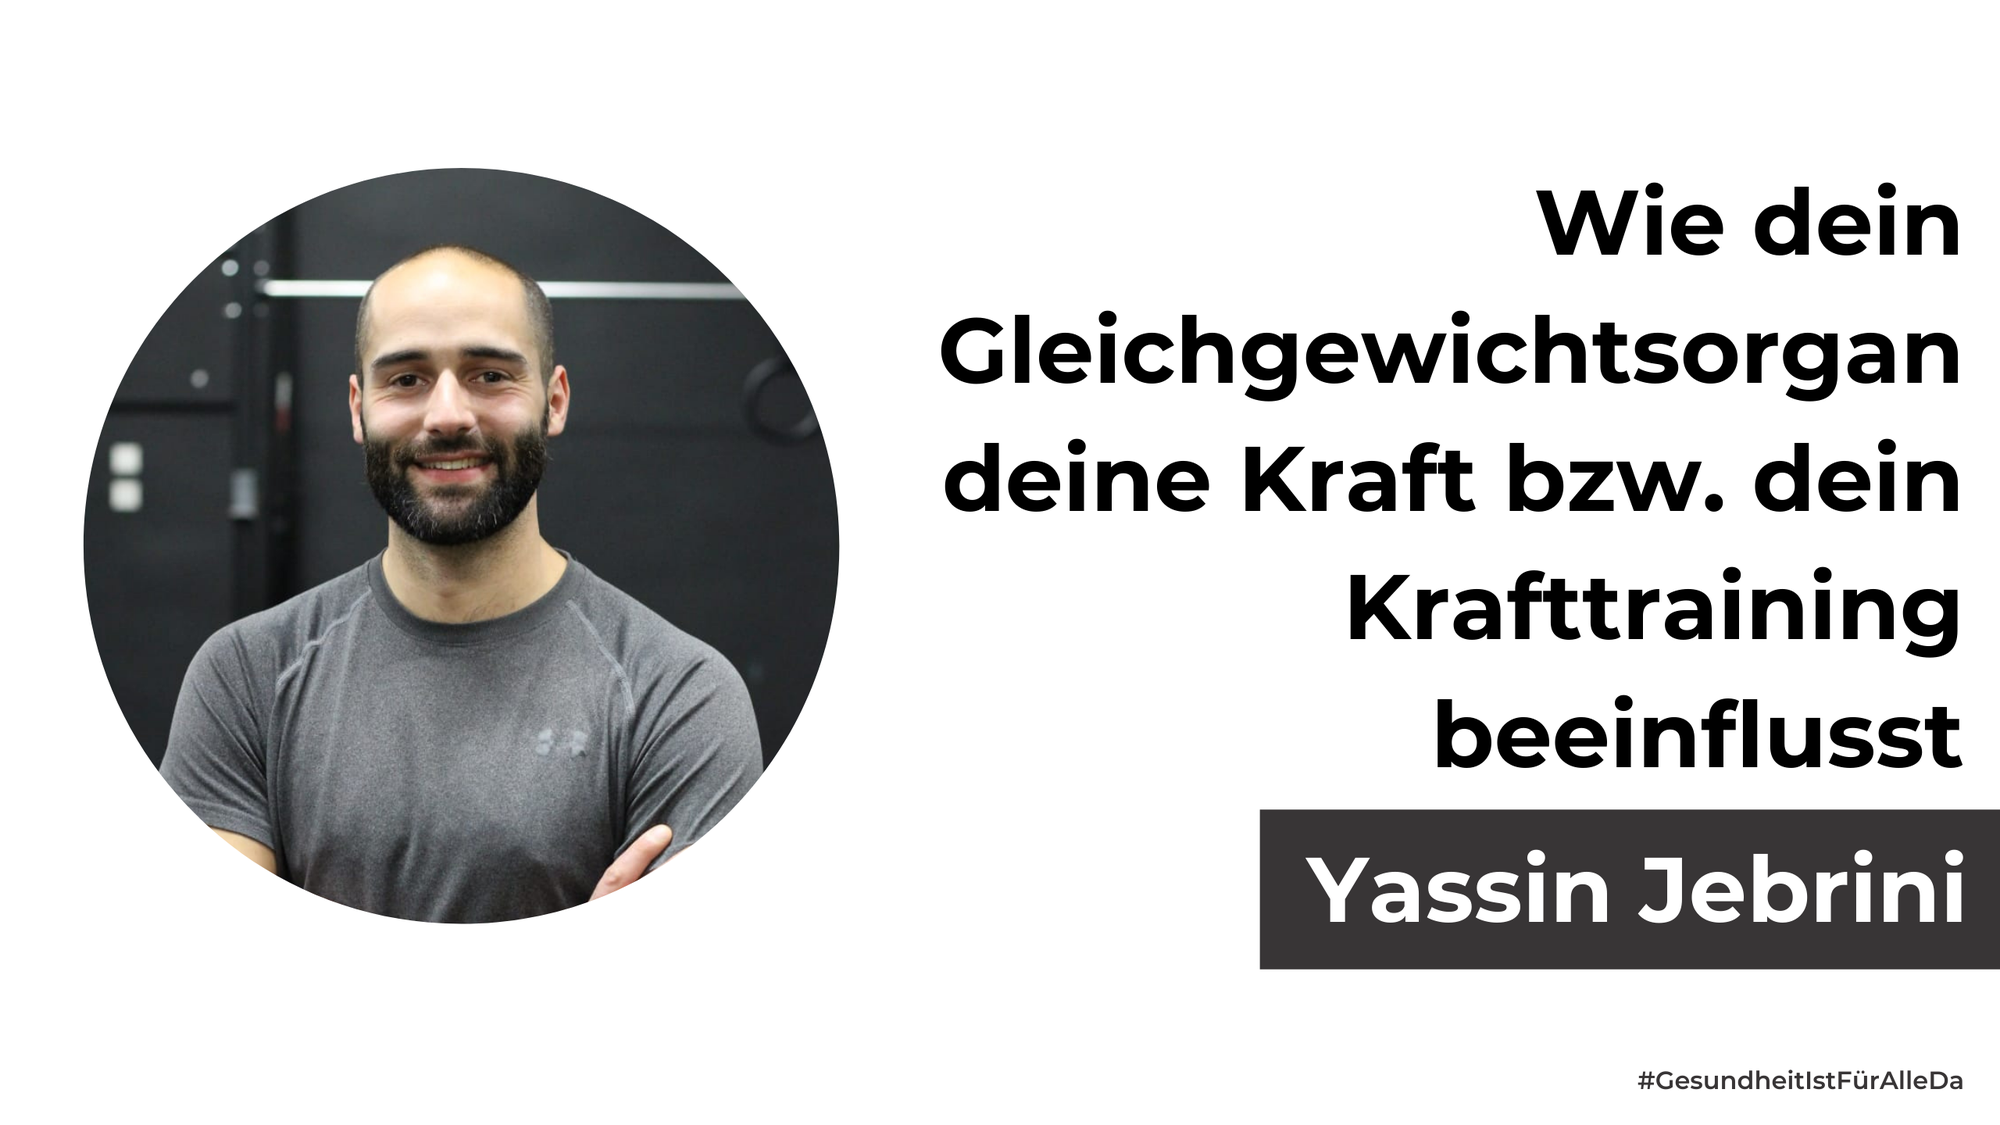 Jassin Yebrini